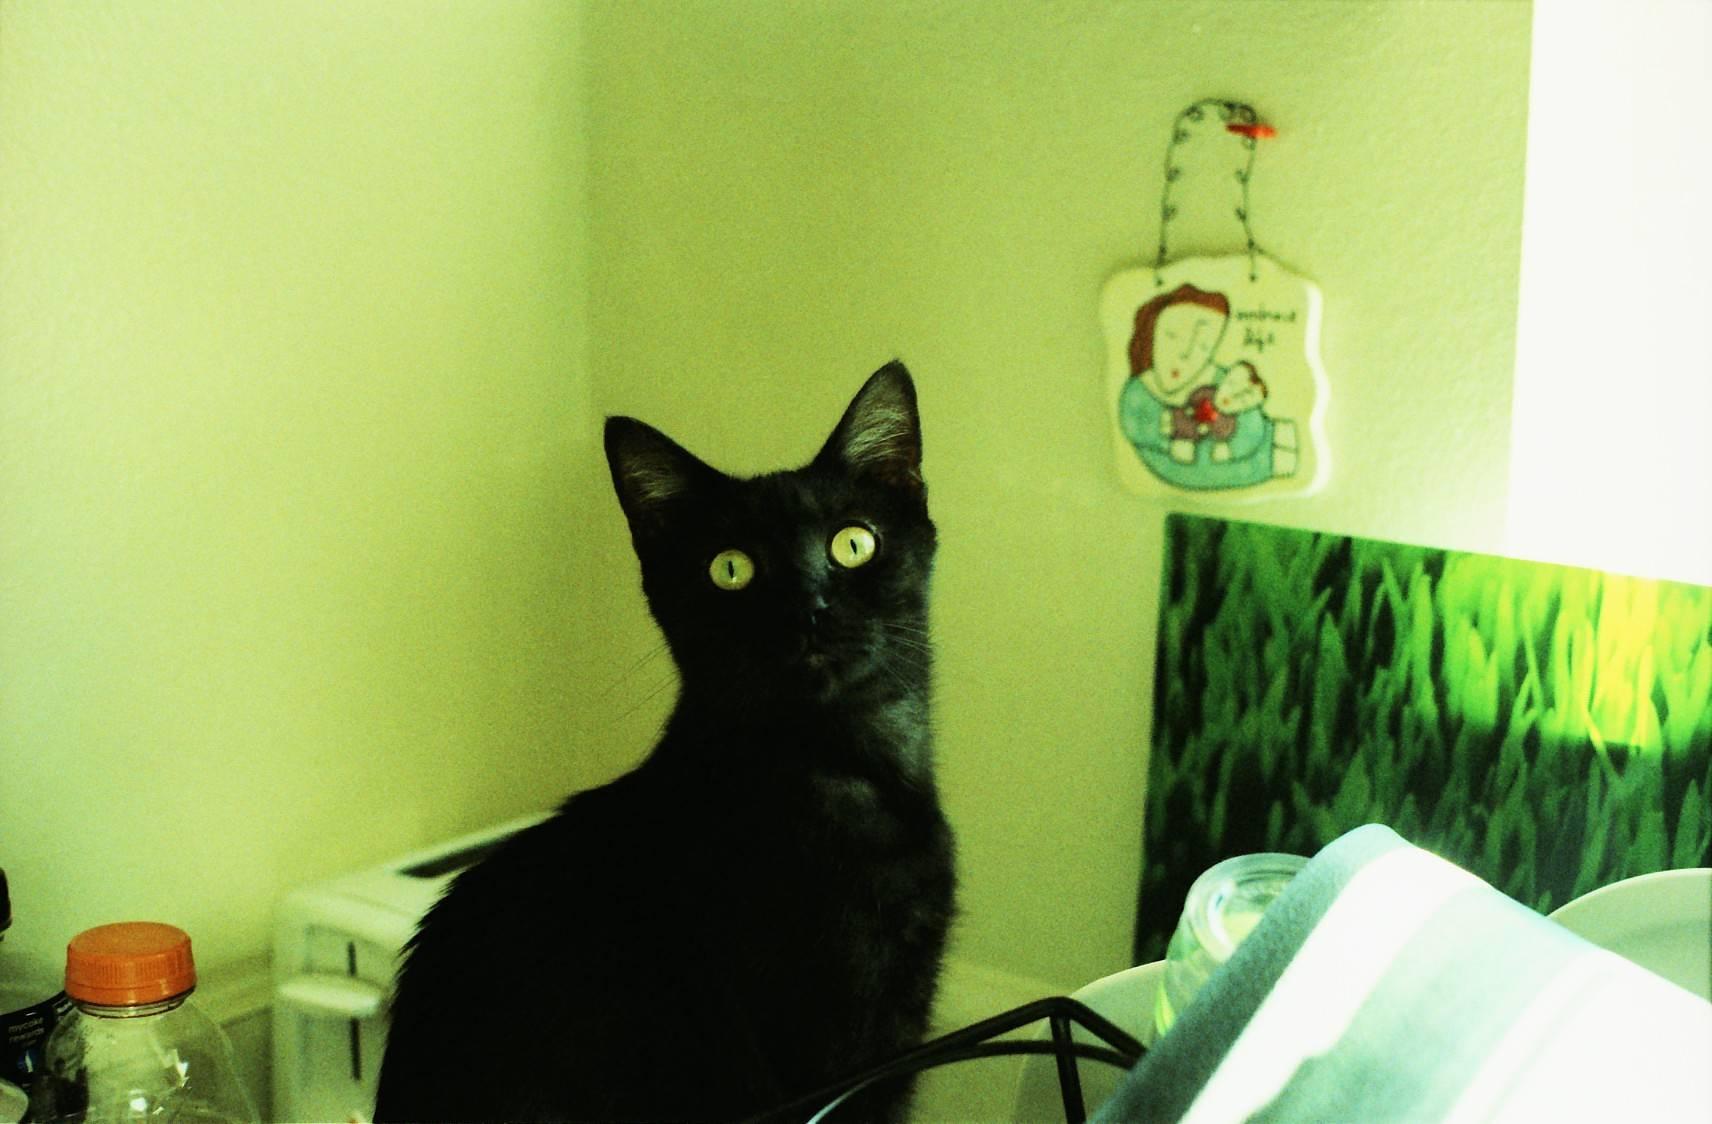 日本東京吉祥寺的 Calico 貓咖啡 · Lomography